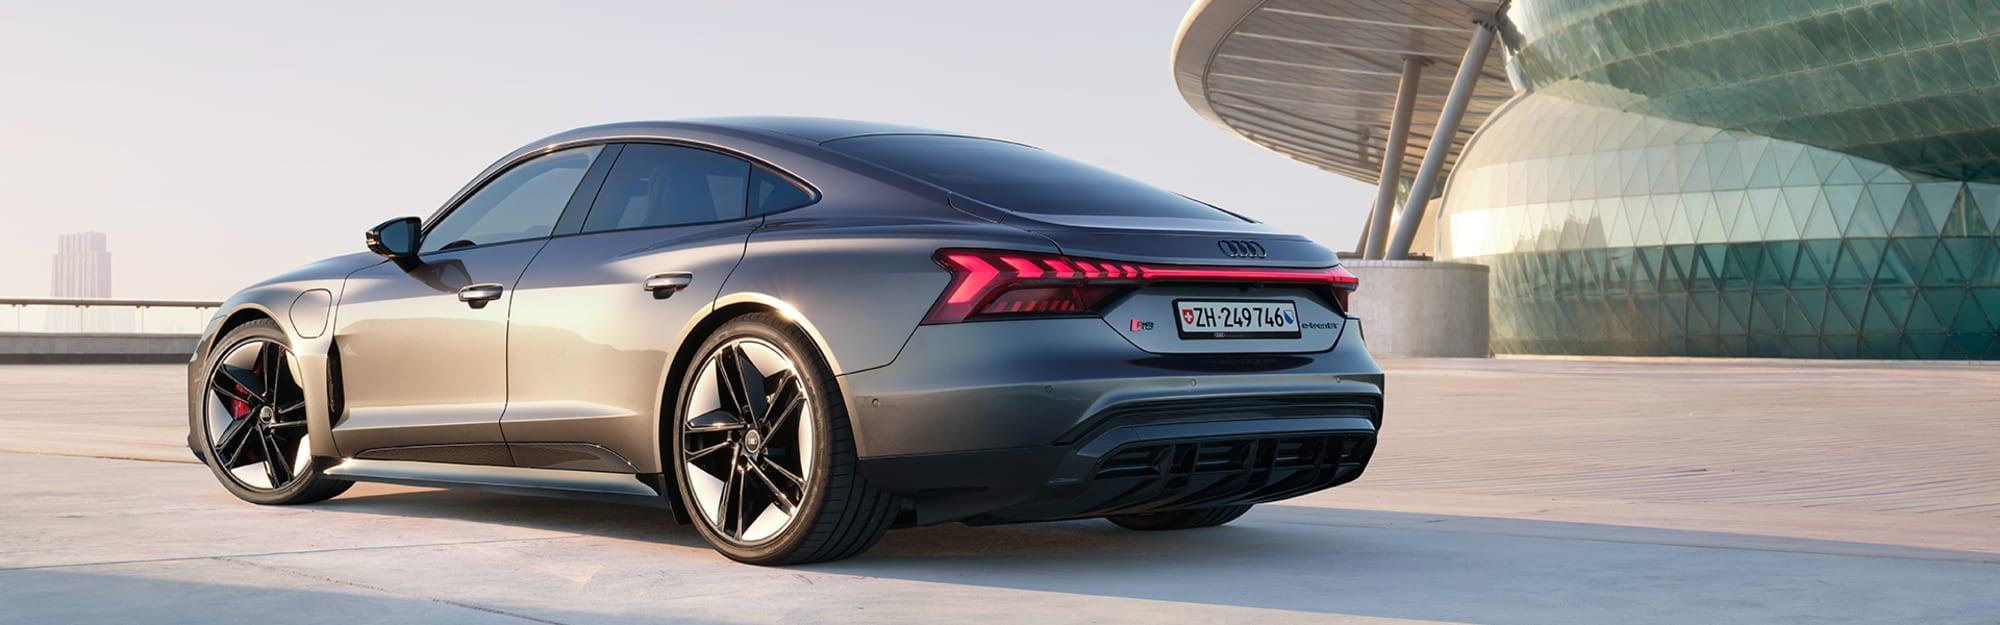 Audi_RSetronGT_Haendlerwebseite_1920x600px